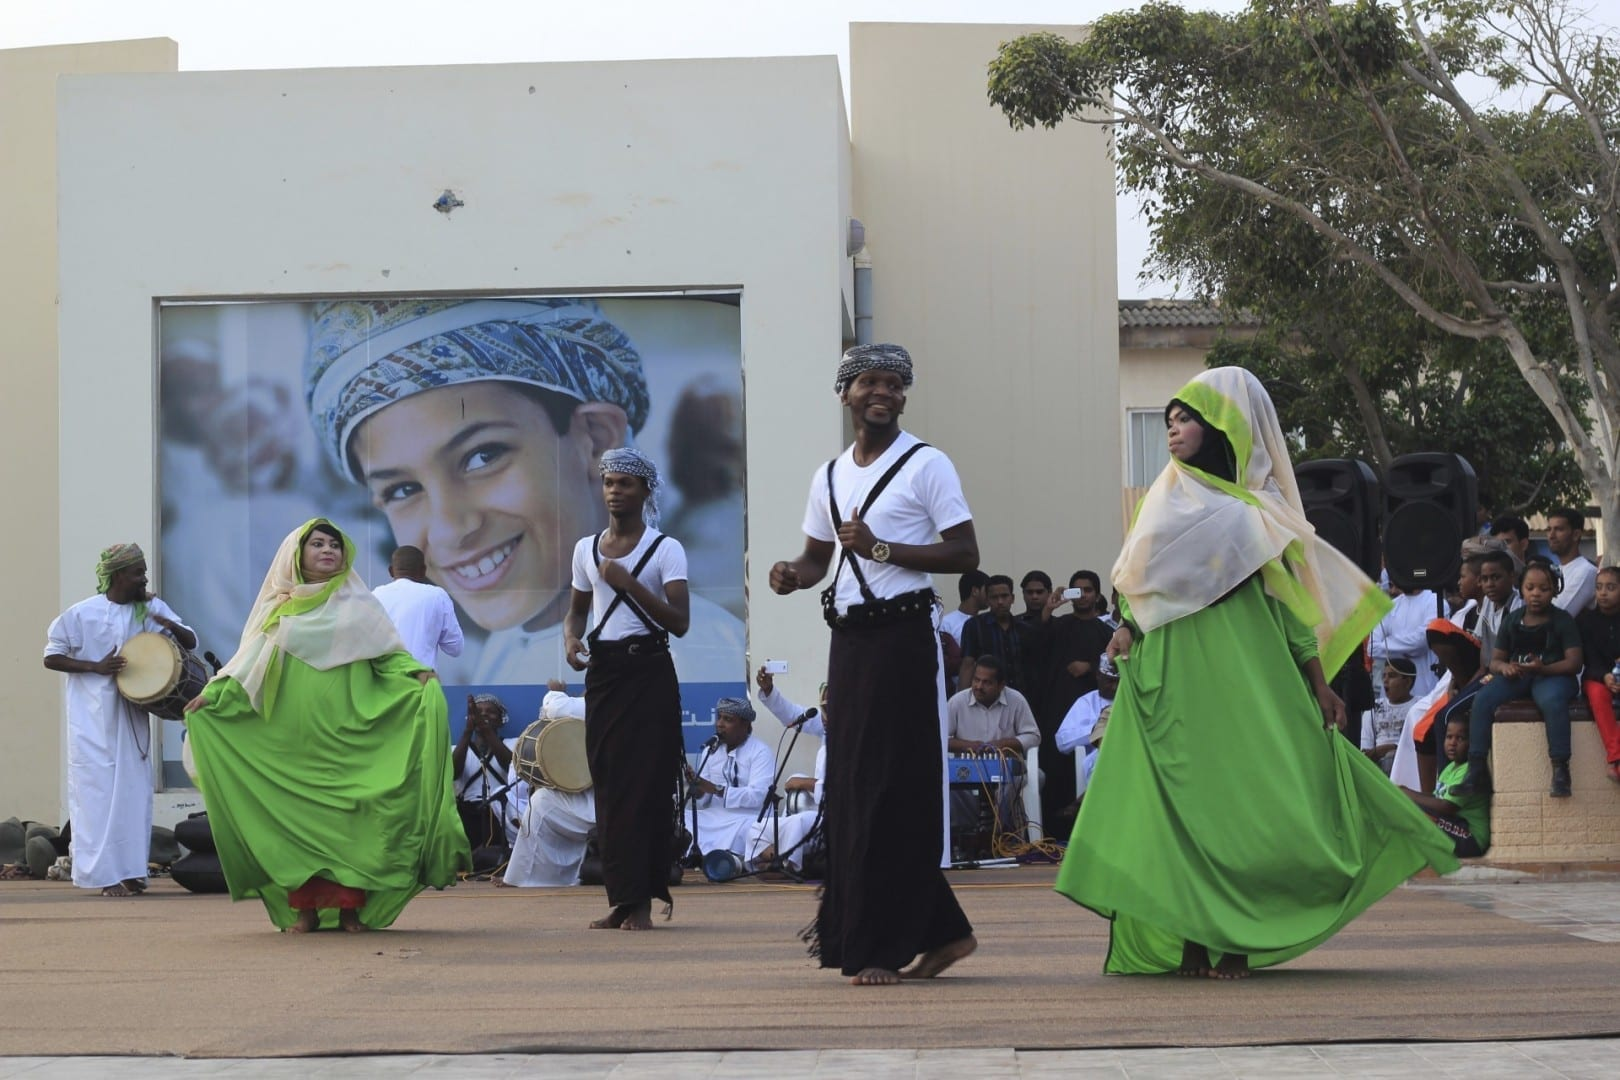 Actuación de danza durante el Festival de Salalah Salalah Omán